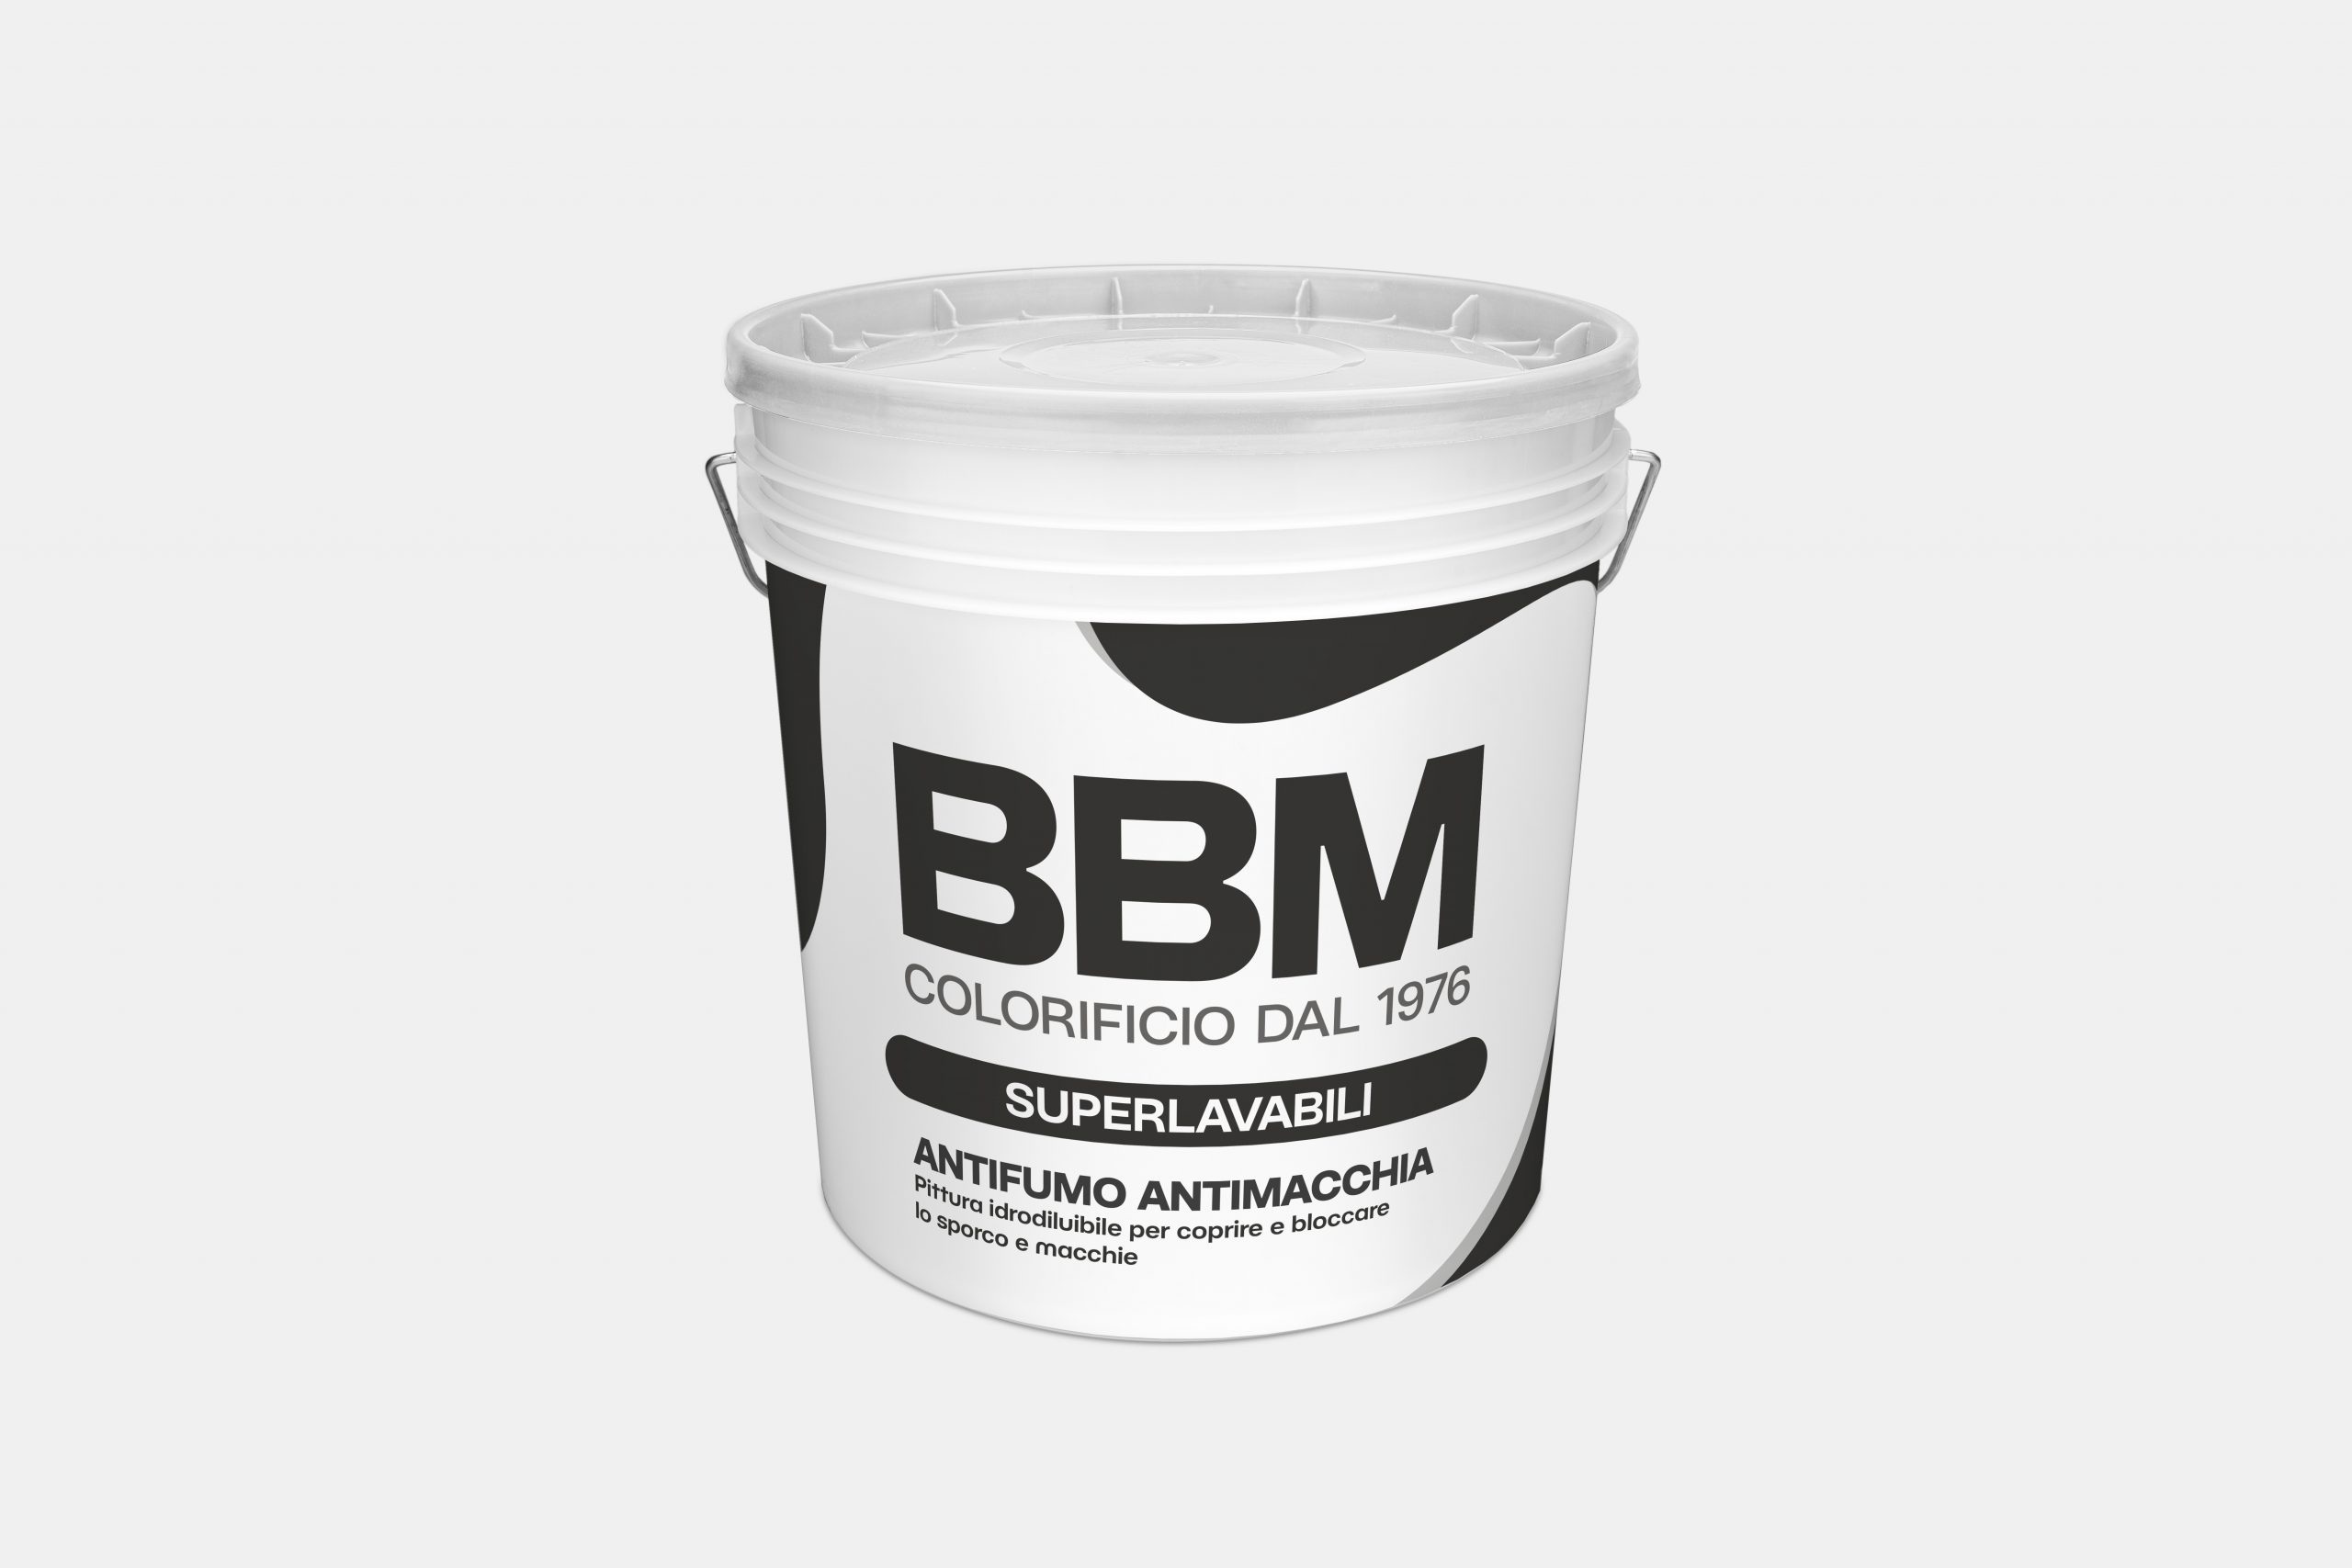 https://bbm-colorificio.it/wp-content/uploads/2021/07/Antifumo-antimacchia-scaled.jpg